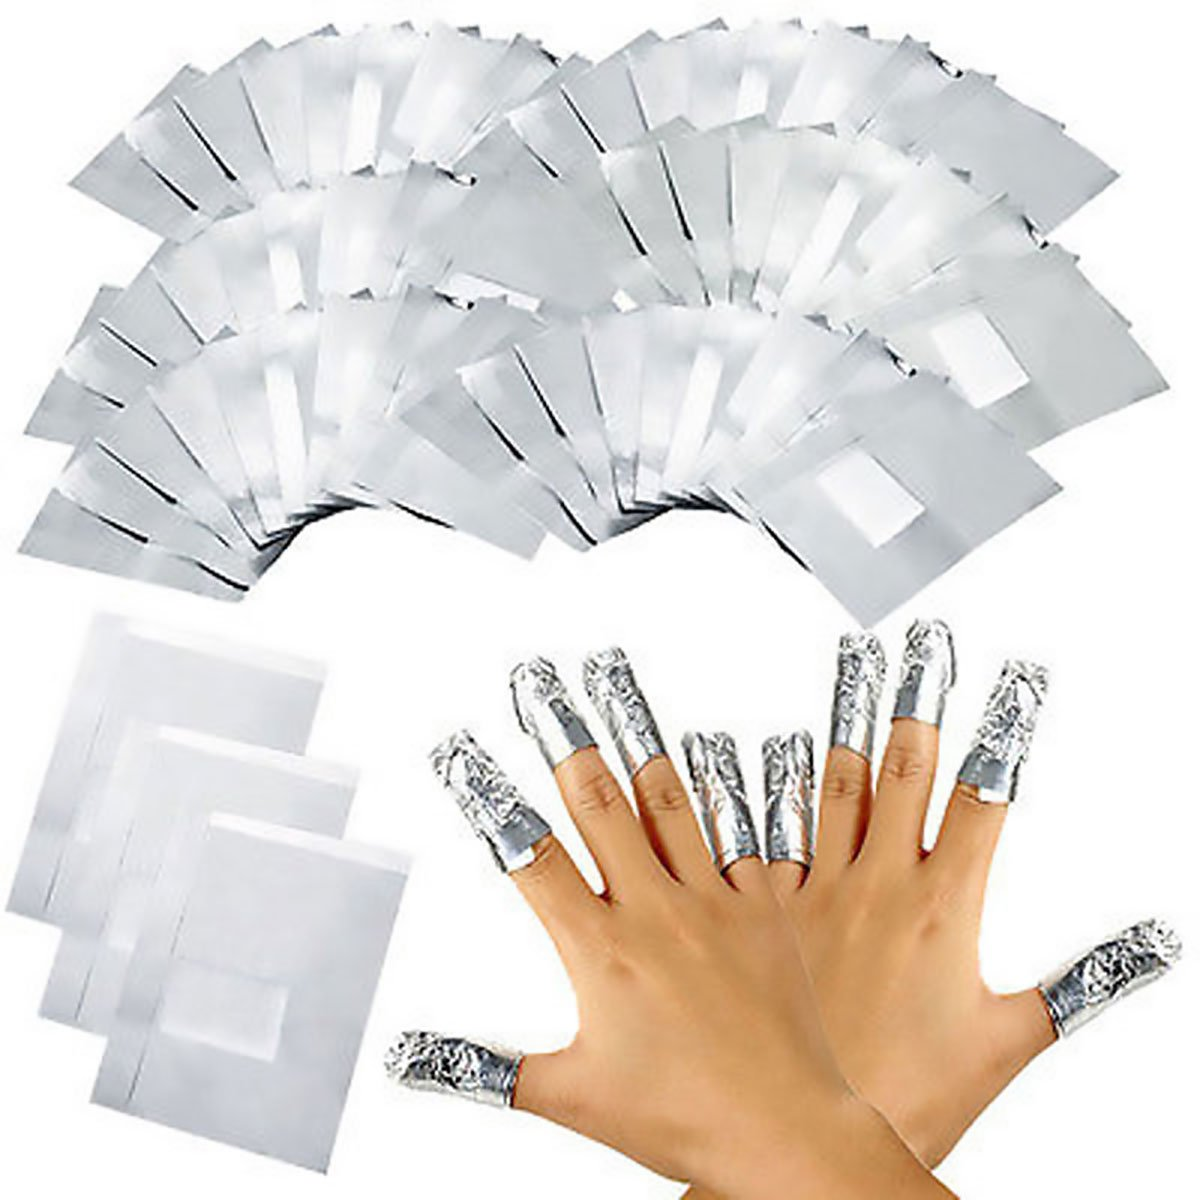 iiniim 100 Pcs Aluminium Foils Nail Wraps Acrylic Gel Polish Remover with Cotton Pad Fast Soak Off Nail Gel Polish Removing ' iiniim